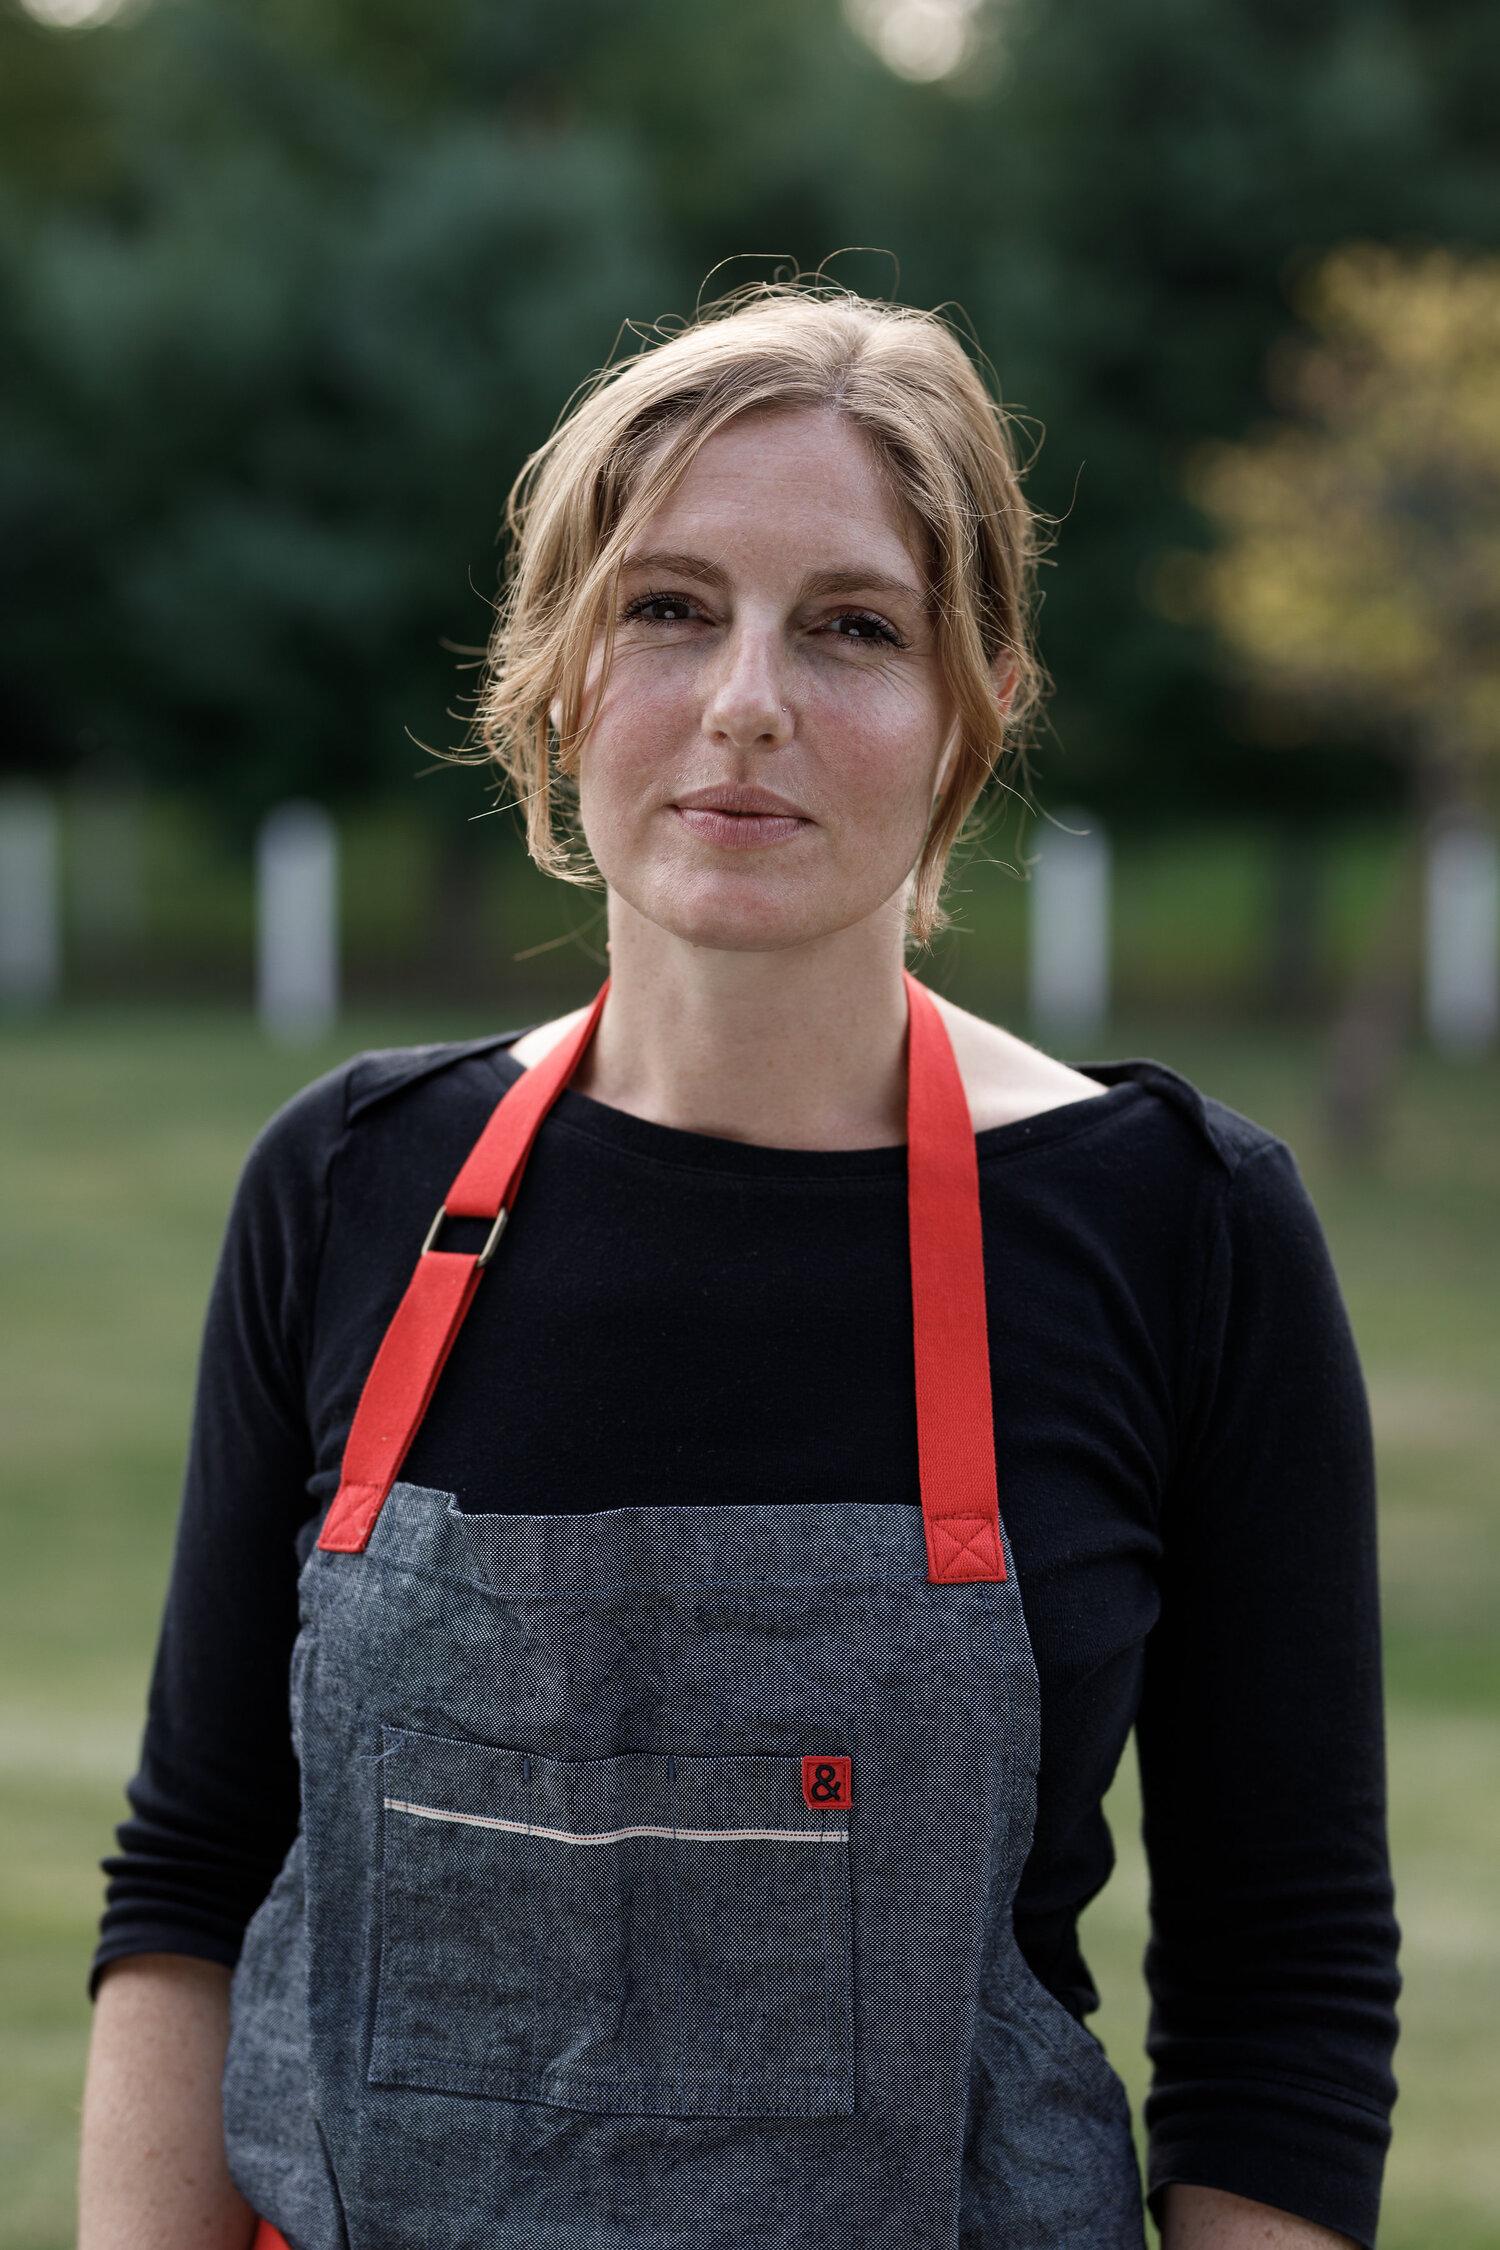 Cookbook author and chef Abra Berens